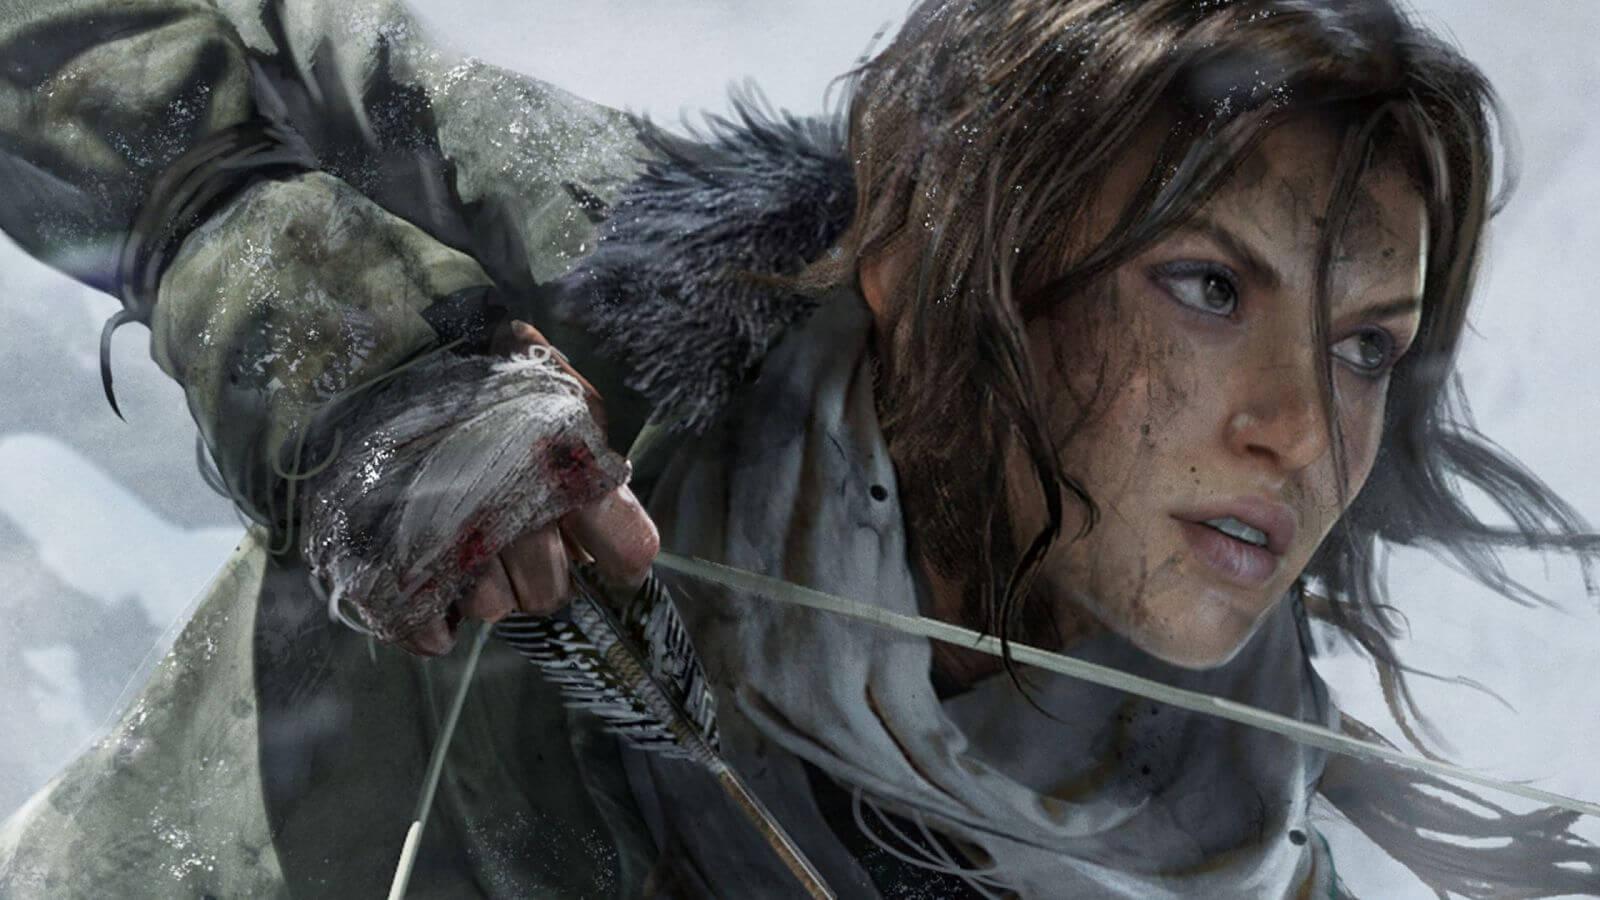 riseo of tomb raider para ps4 - Square Enix anuncia Rise of Tomb Raider para PlayStation 4, mas só em 2016